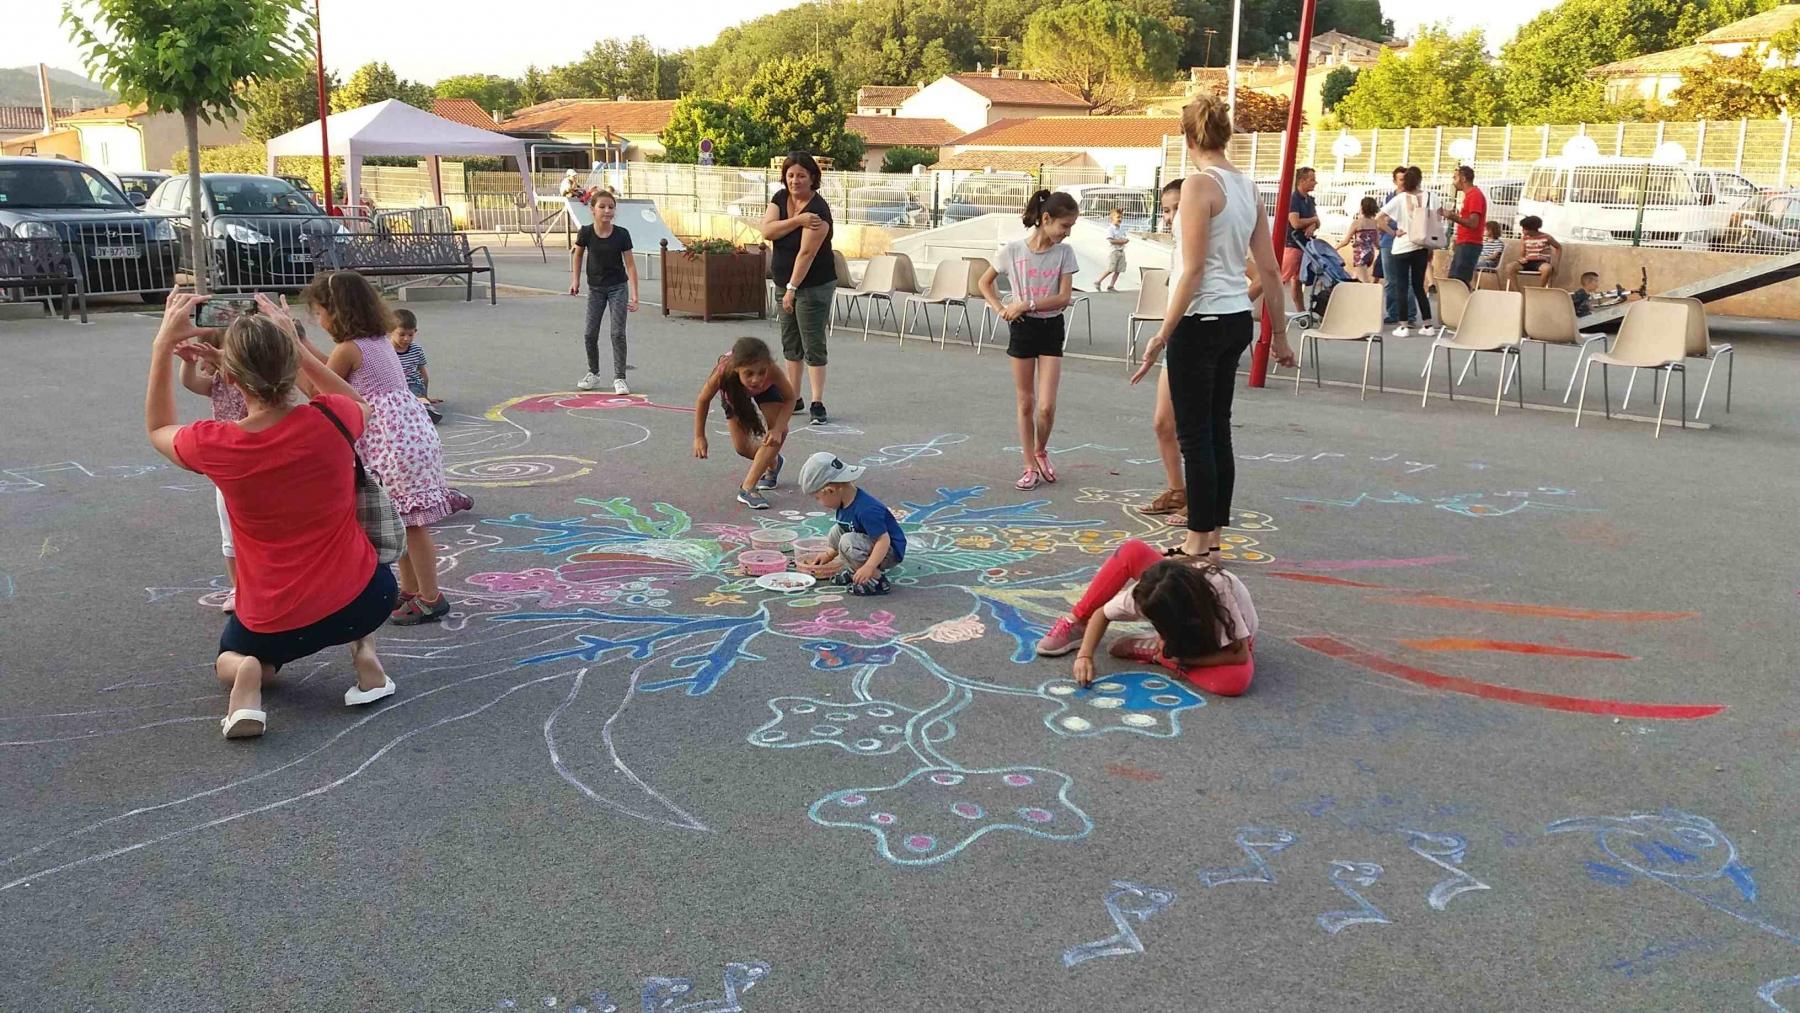 2018-Street-painting-en-familleLa-Celle